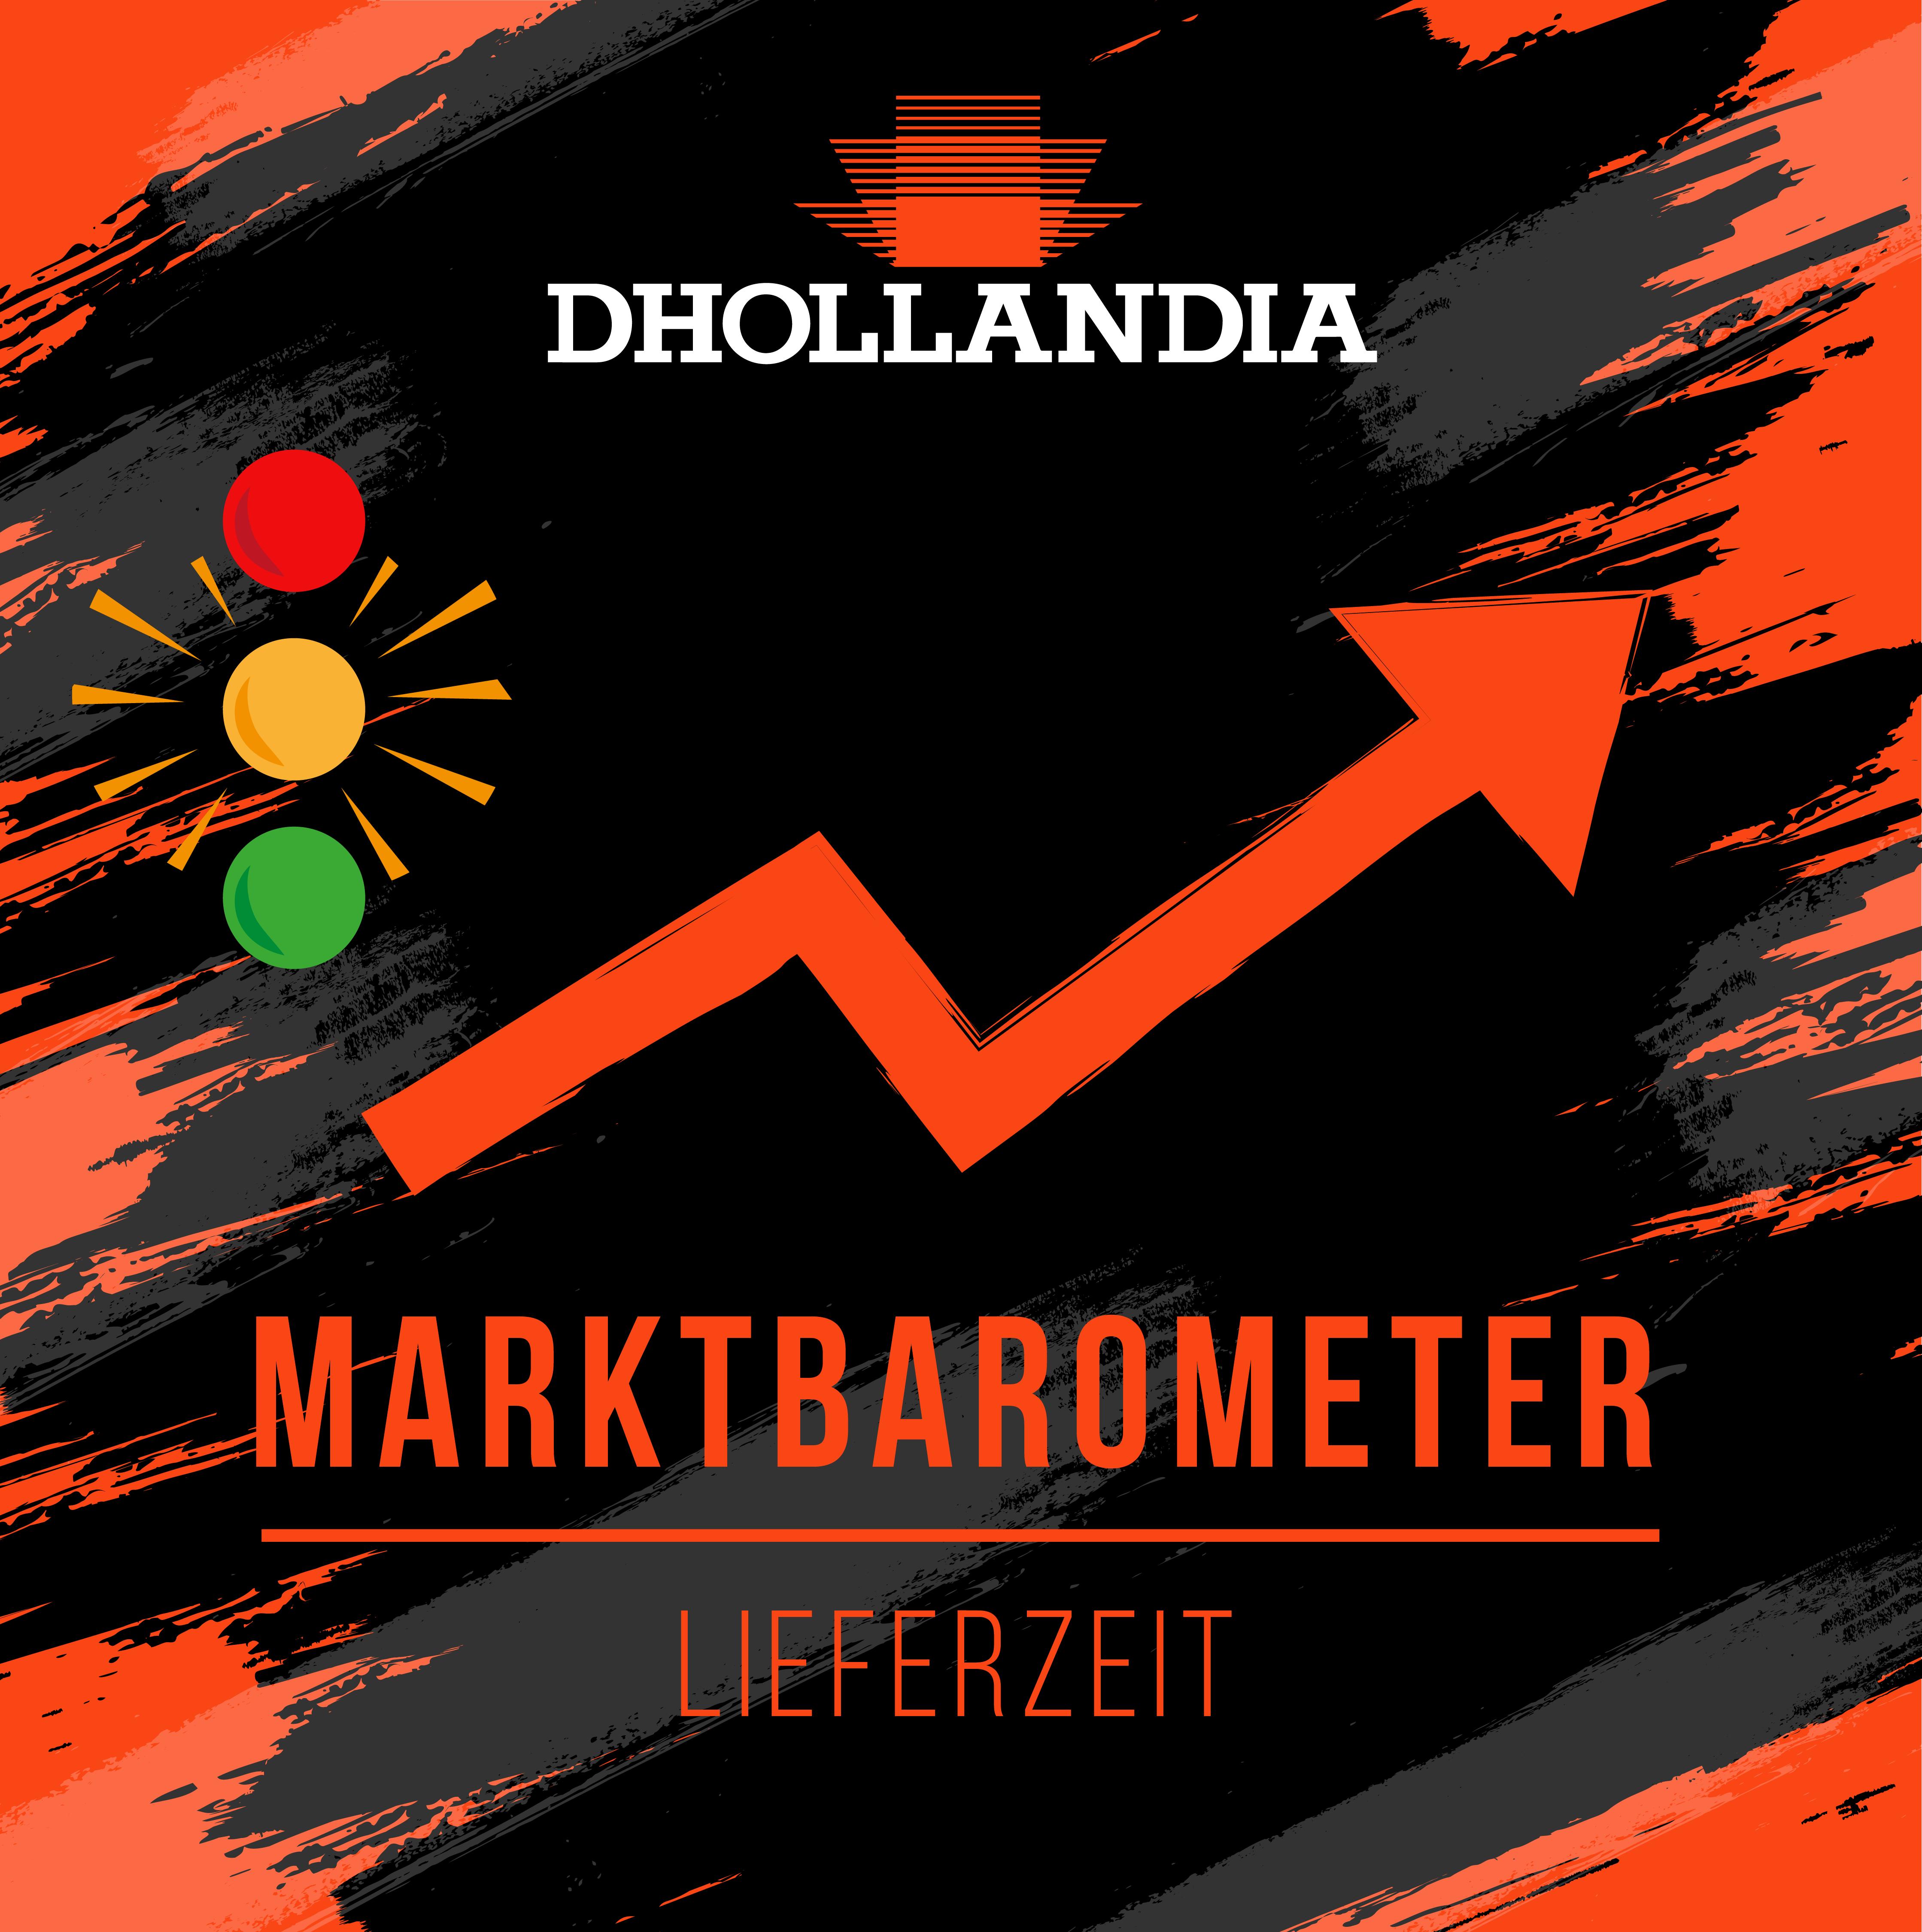 Marktbarometer